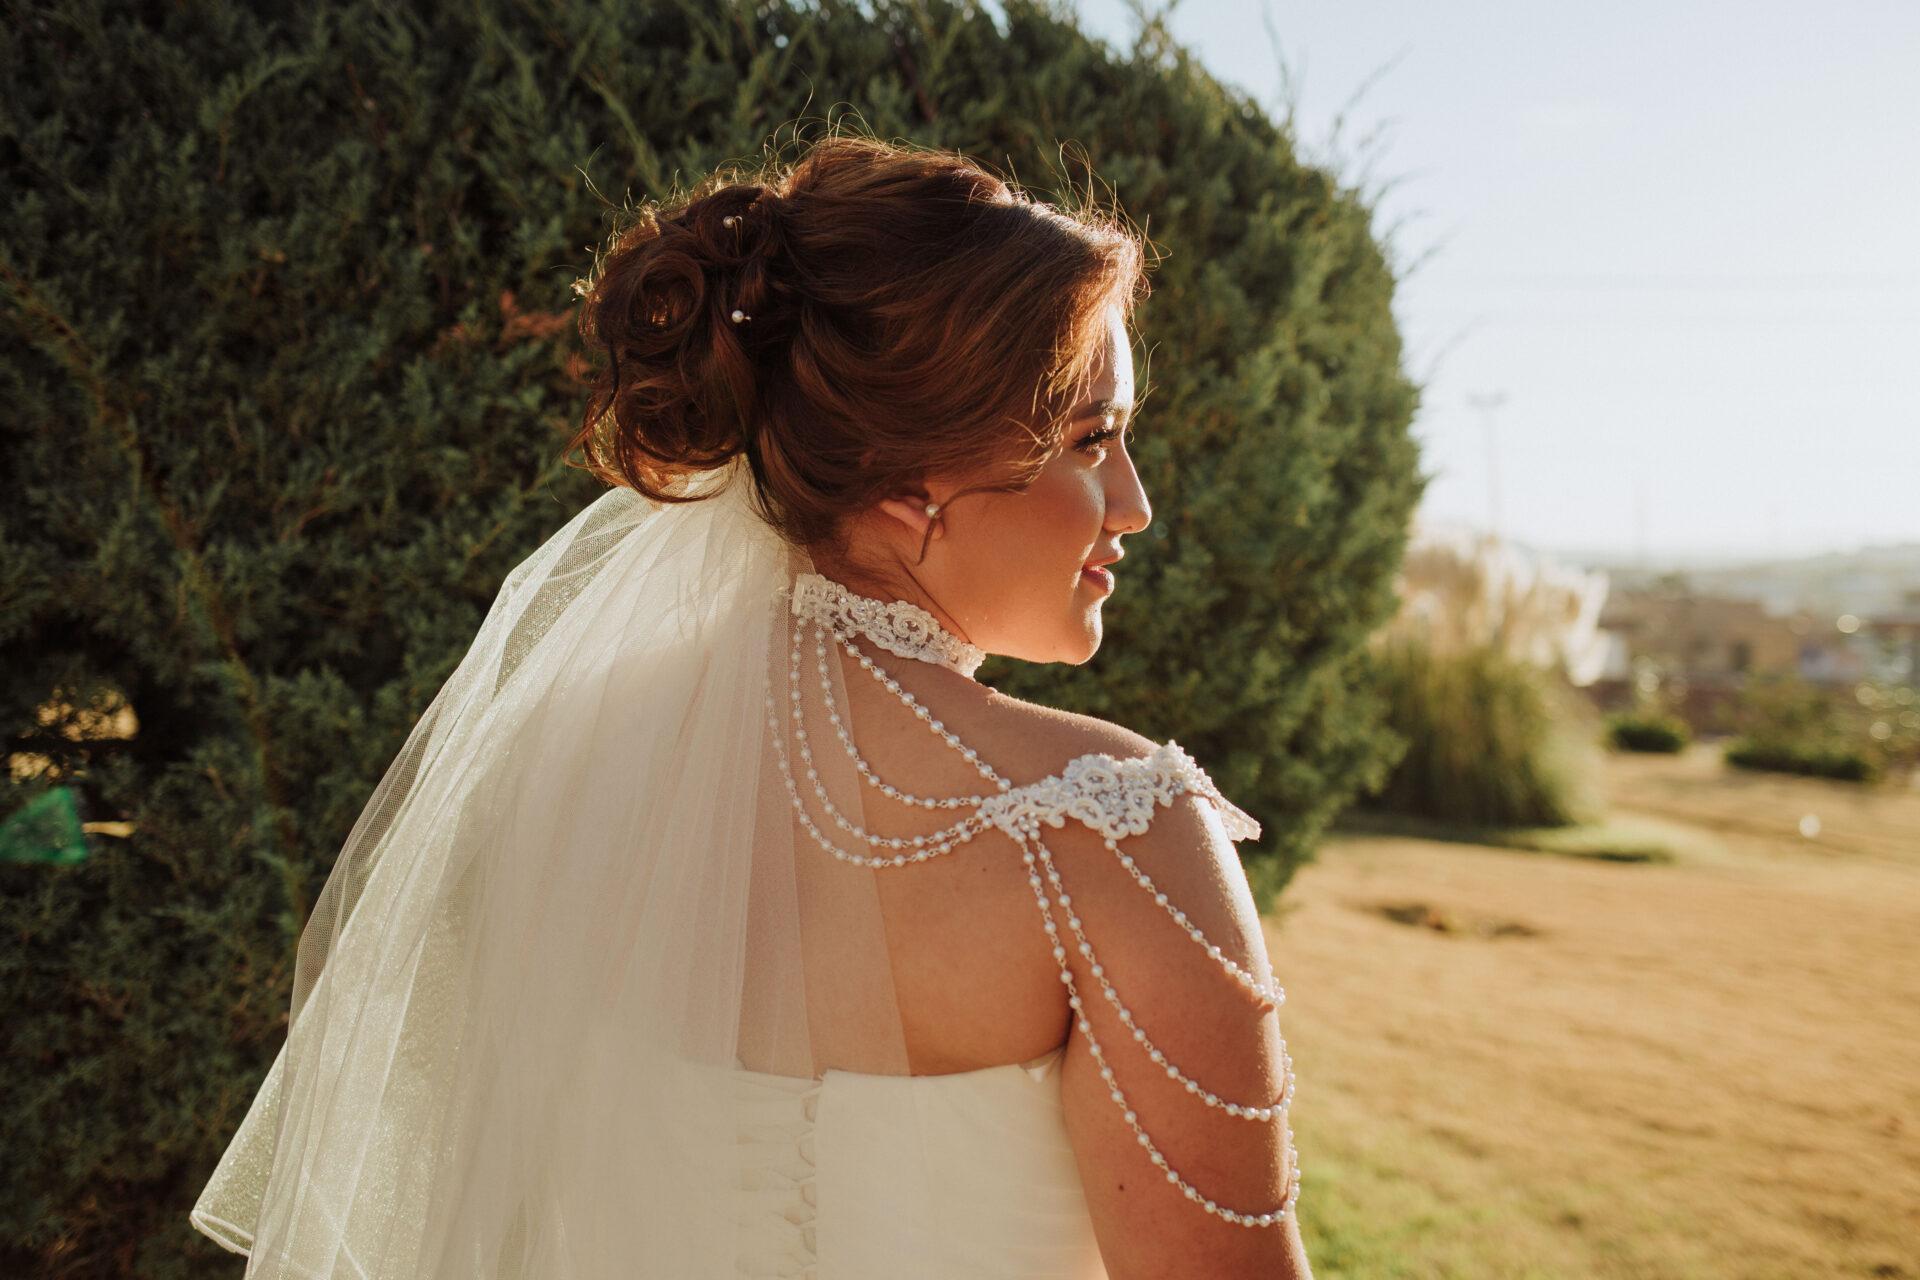 javier_noriega_fotografo_bodas_gaviones_zacatecas_wedding_photographer16